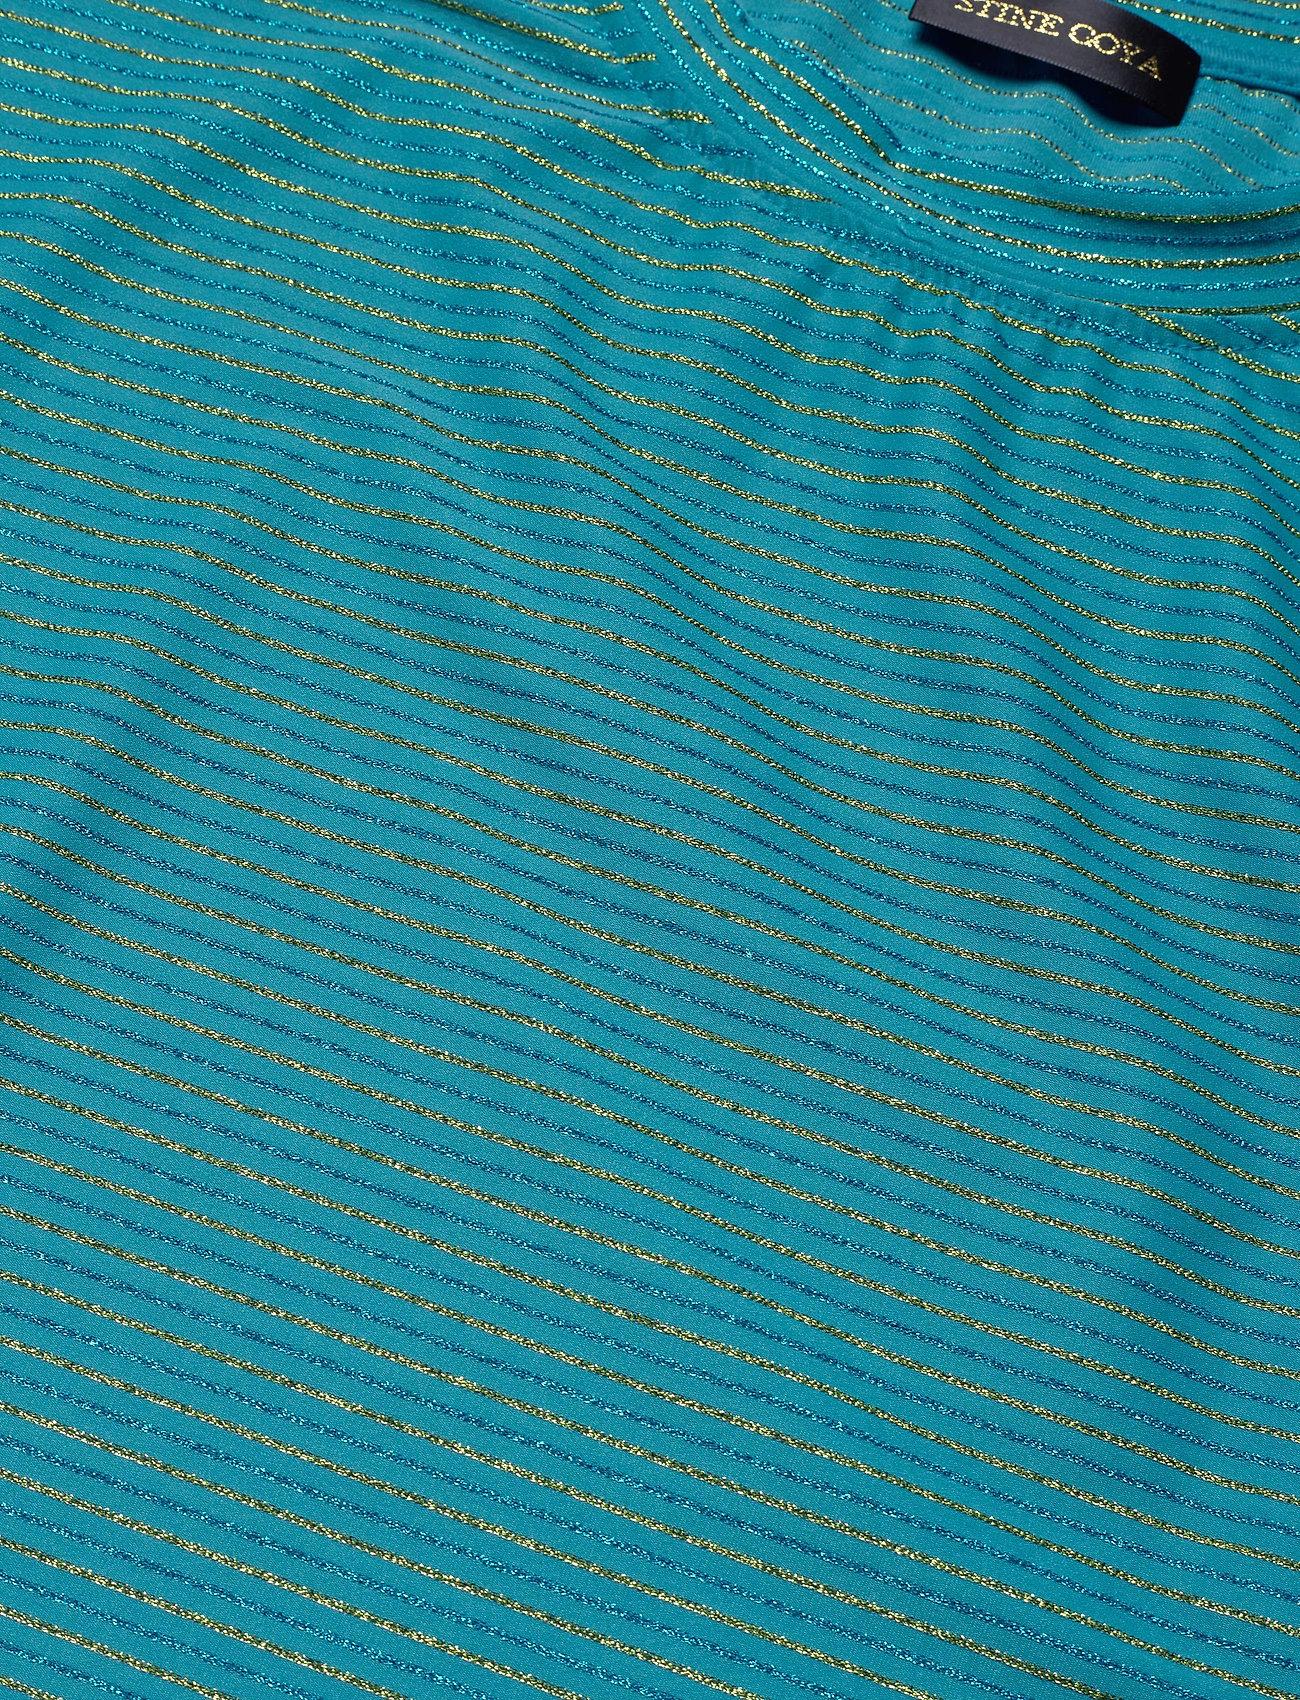 Boris, 850 Glitter Jersey   - STINE GOYA -  Women's T-shirts & Tops Get Online